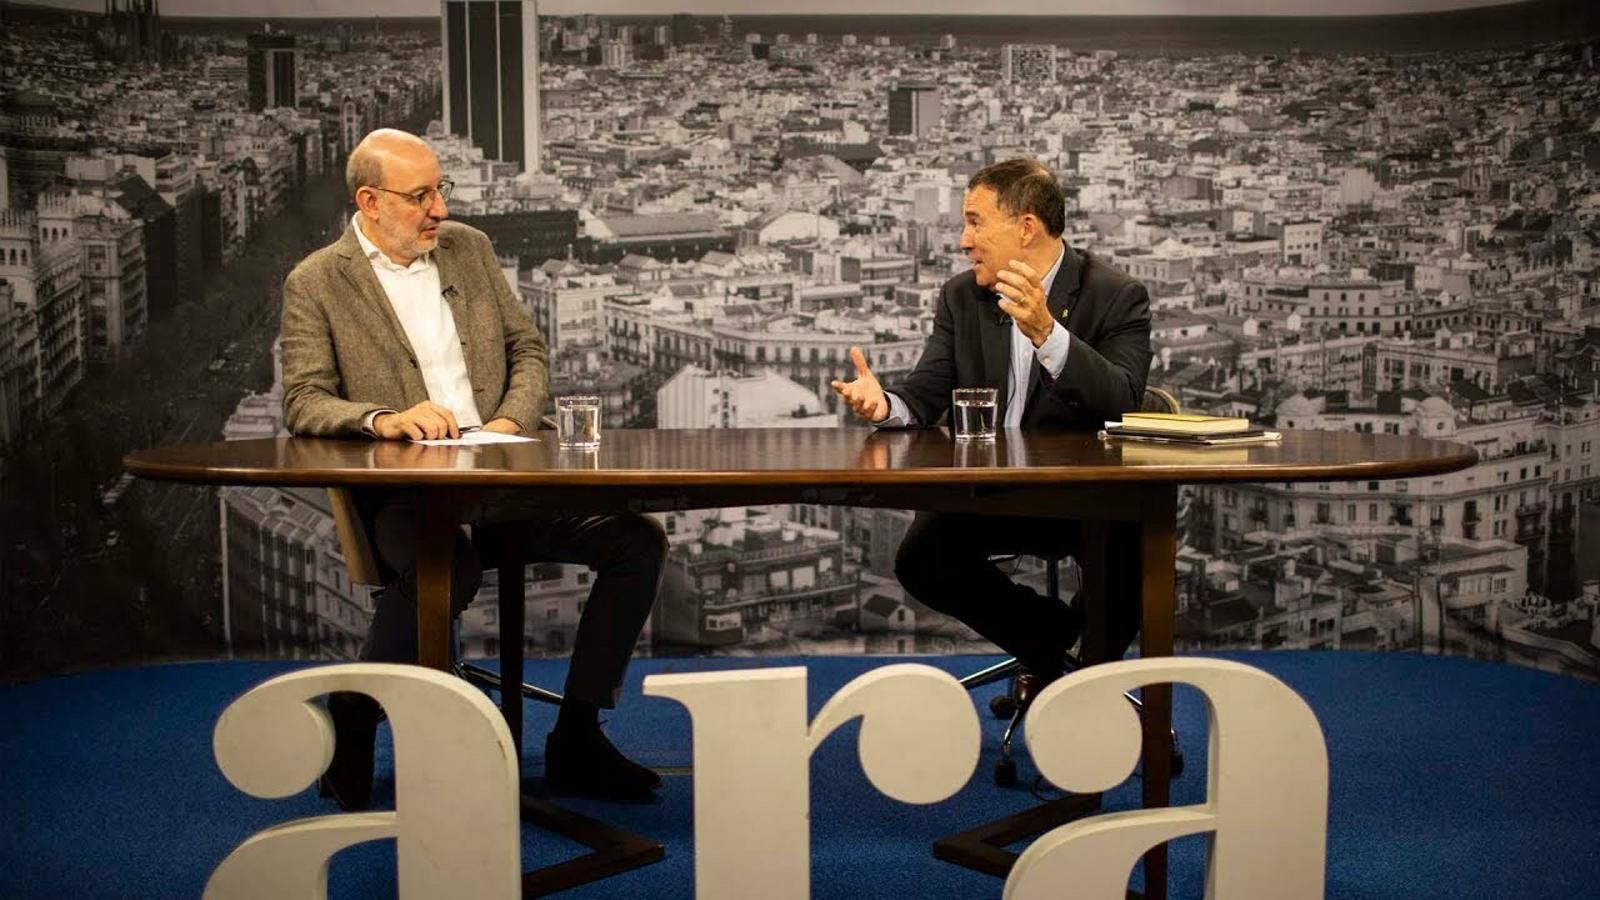 Entrevista d'Antoni Bassas a Jaume Alonso-Cuevillas